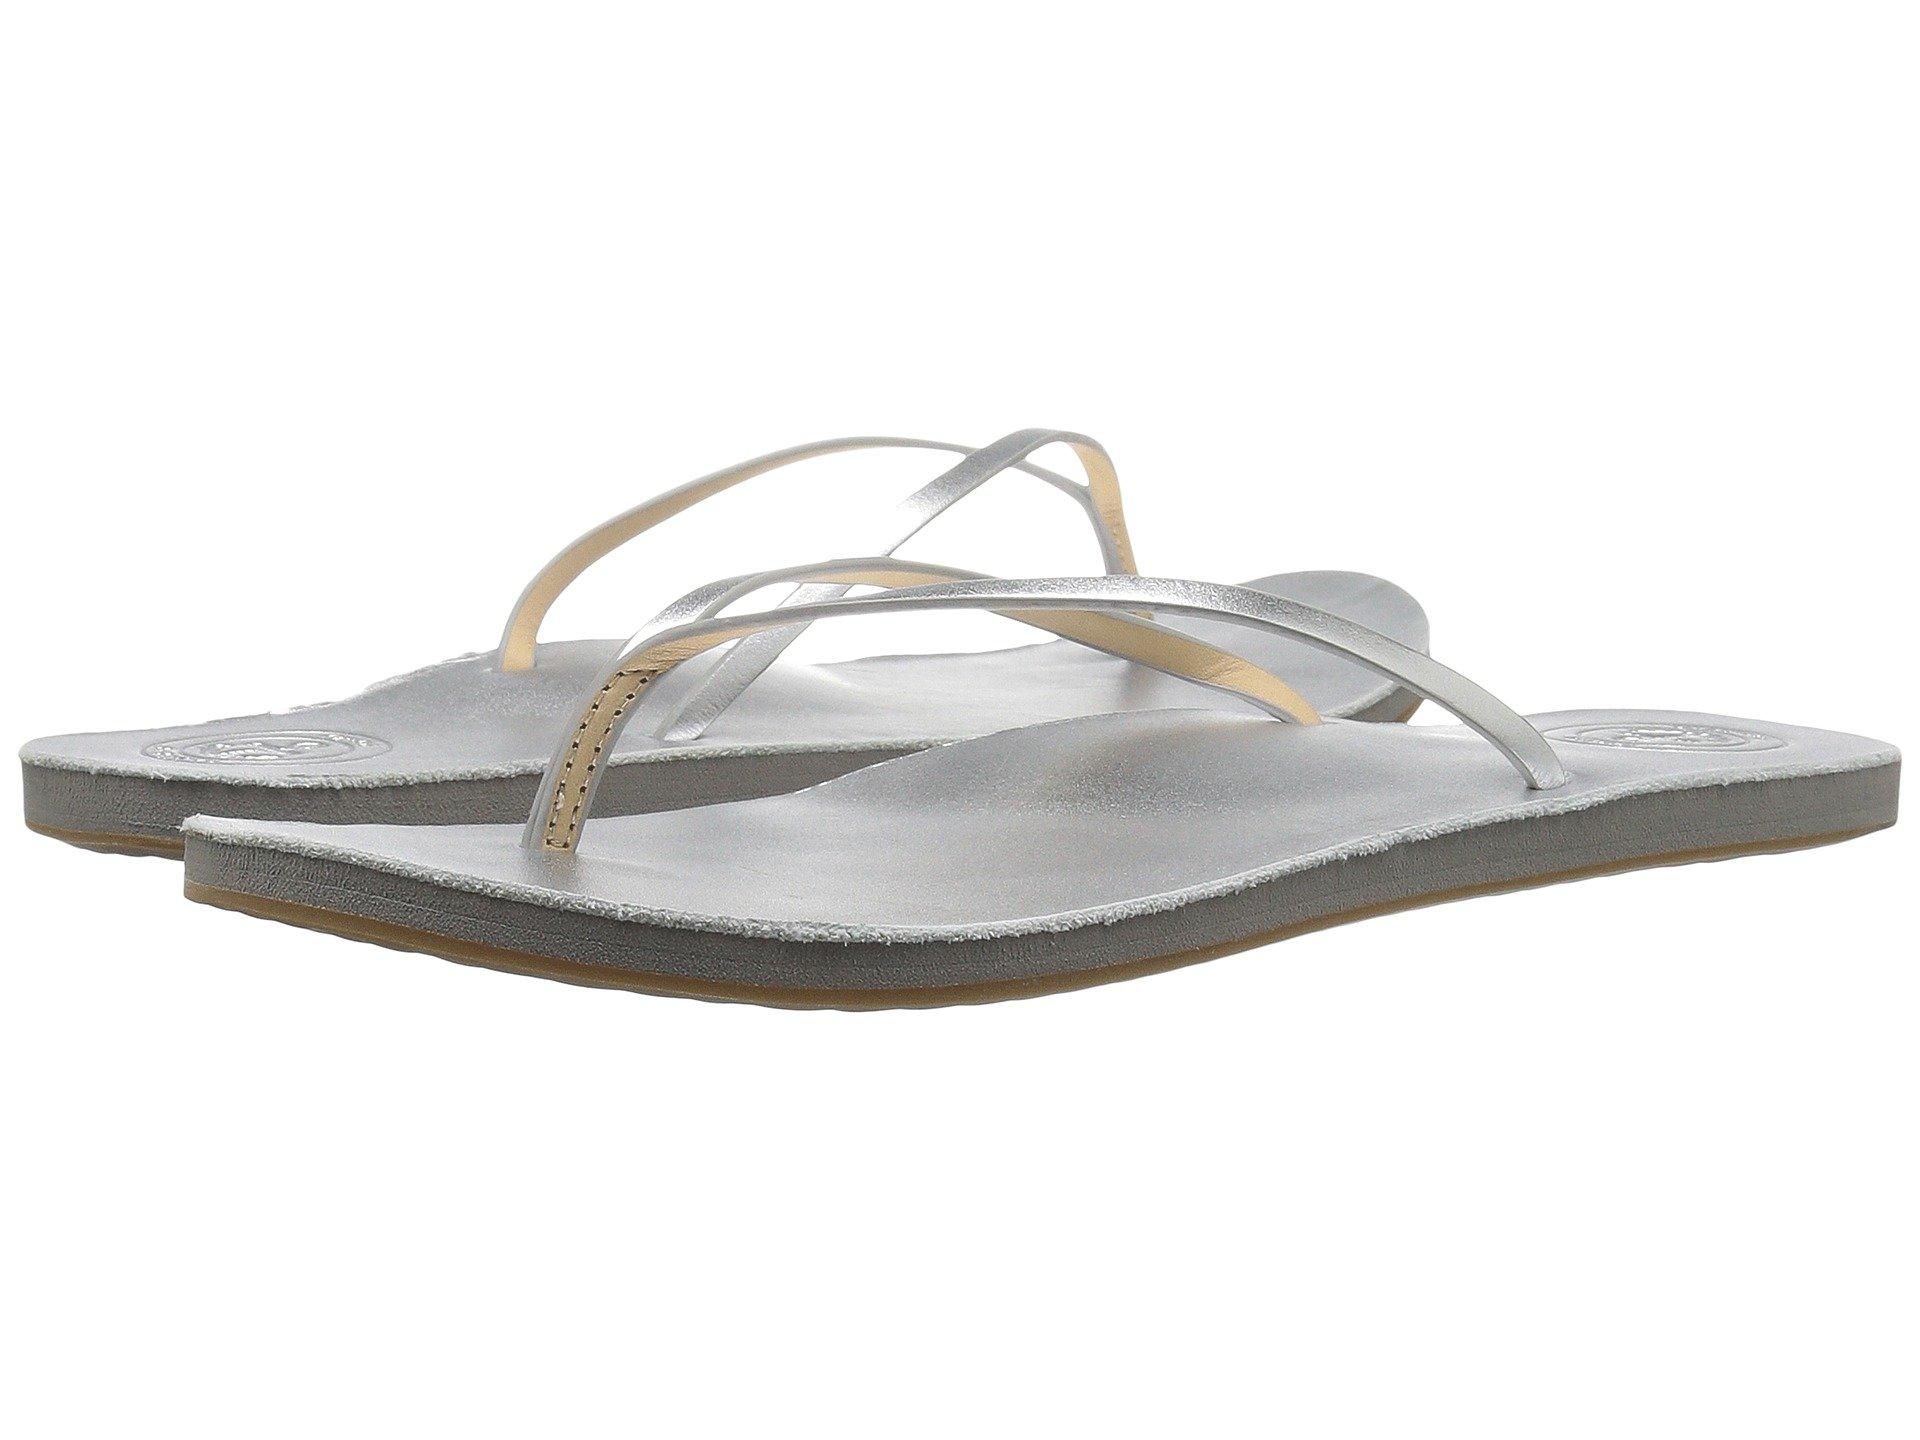 Brooks Shoe Sizes B M What S C D